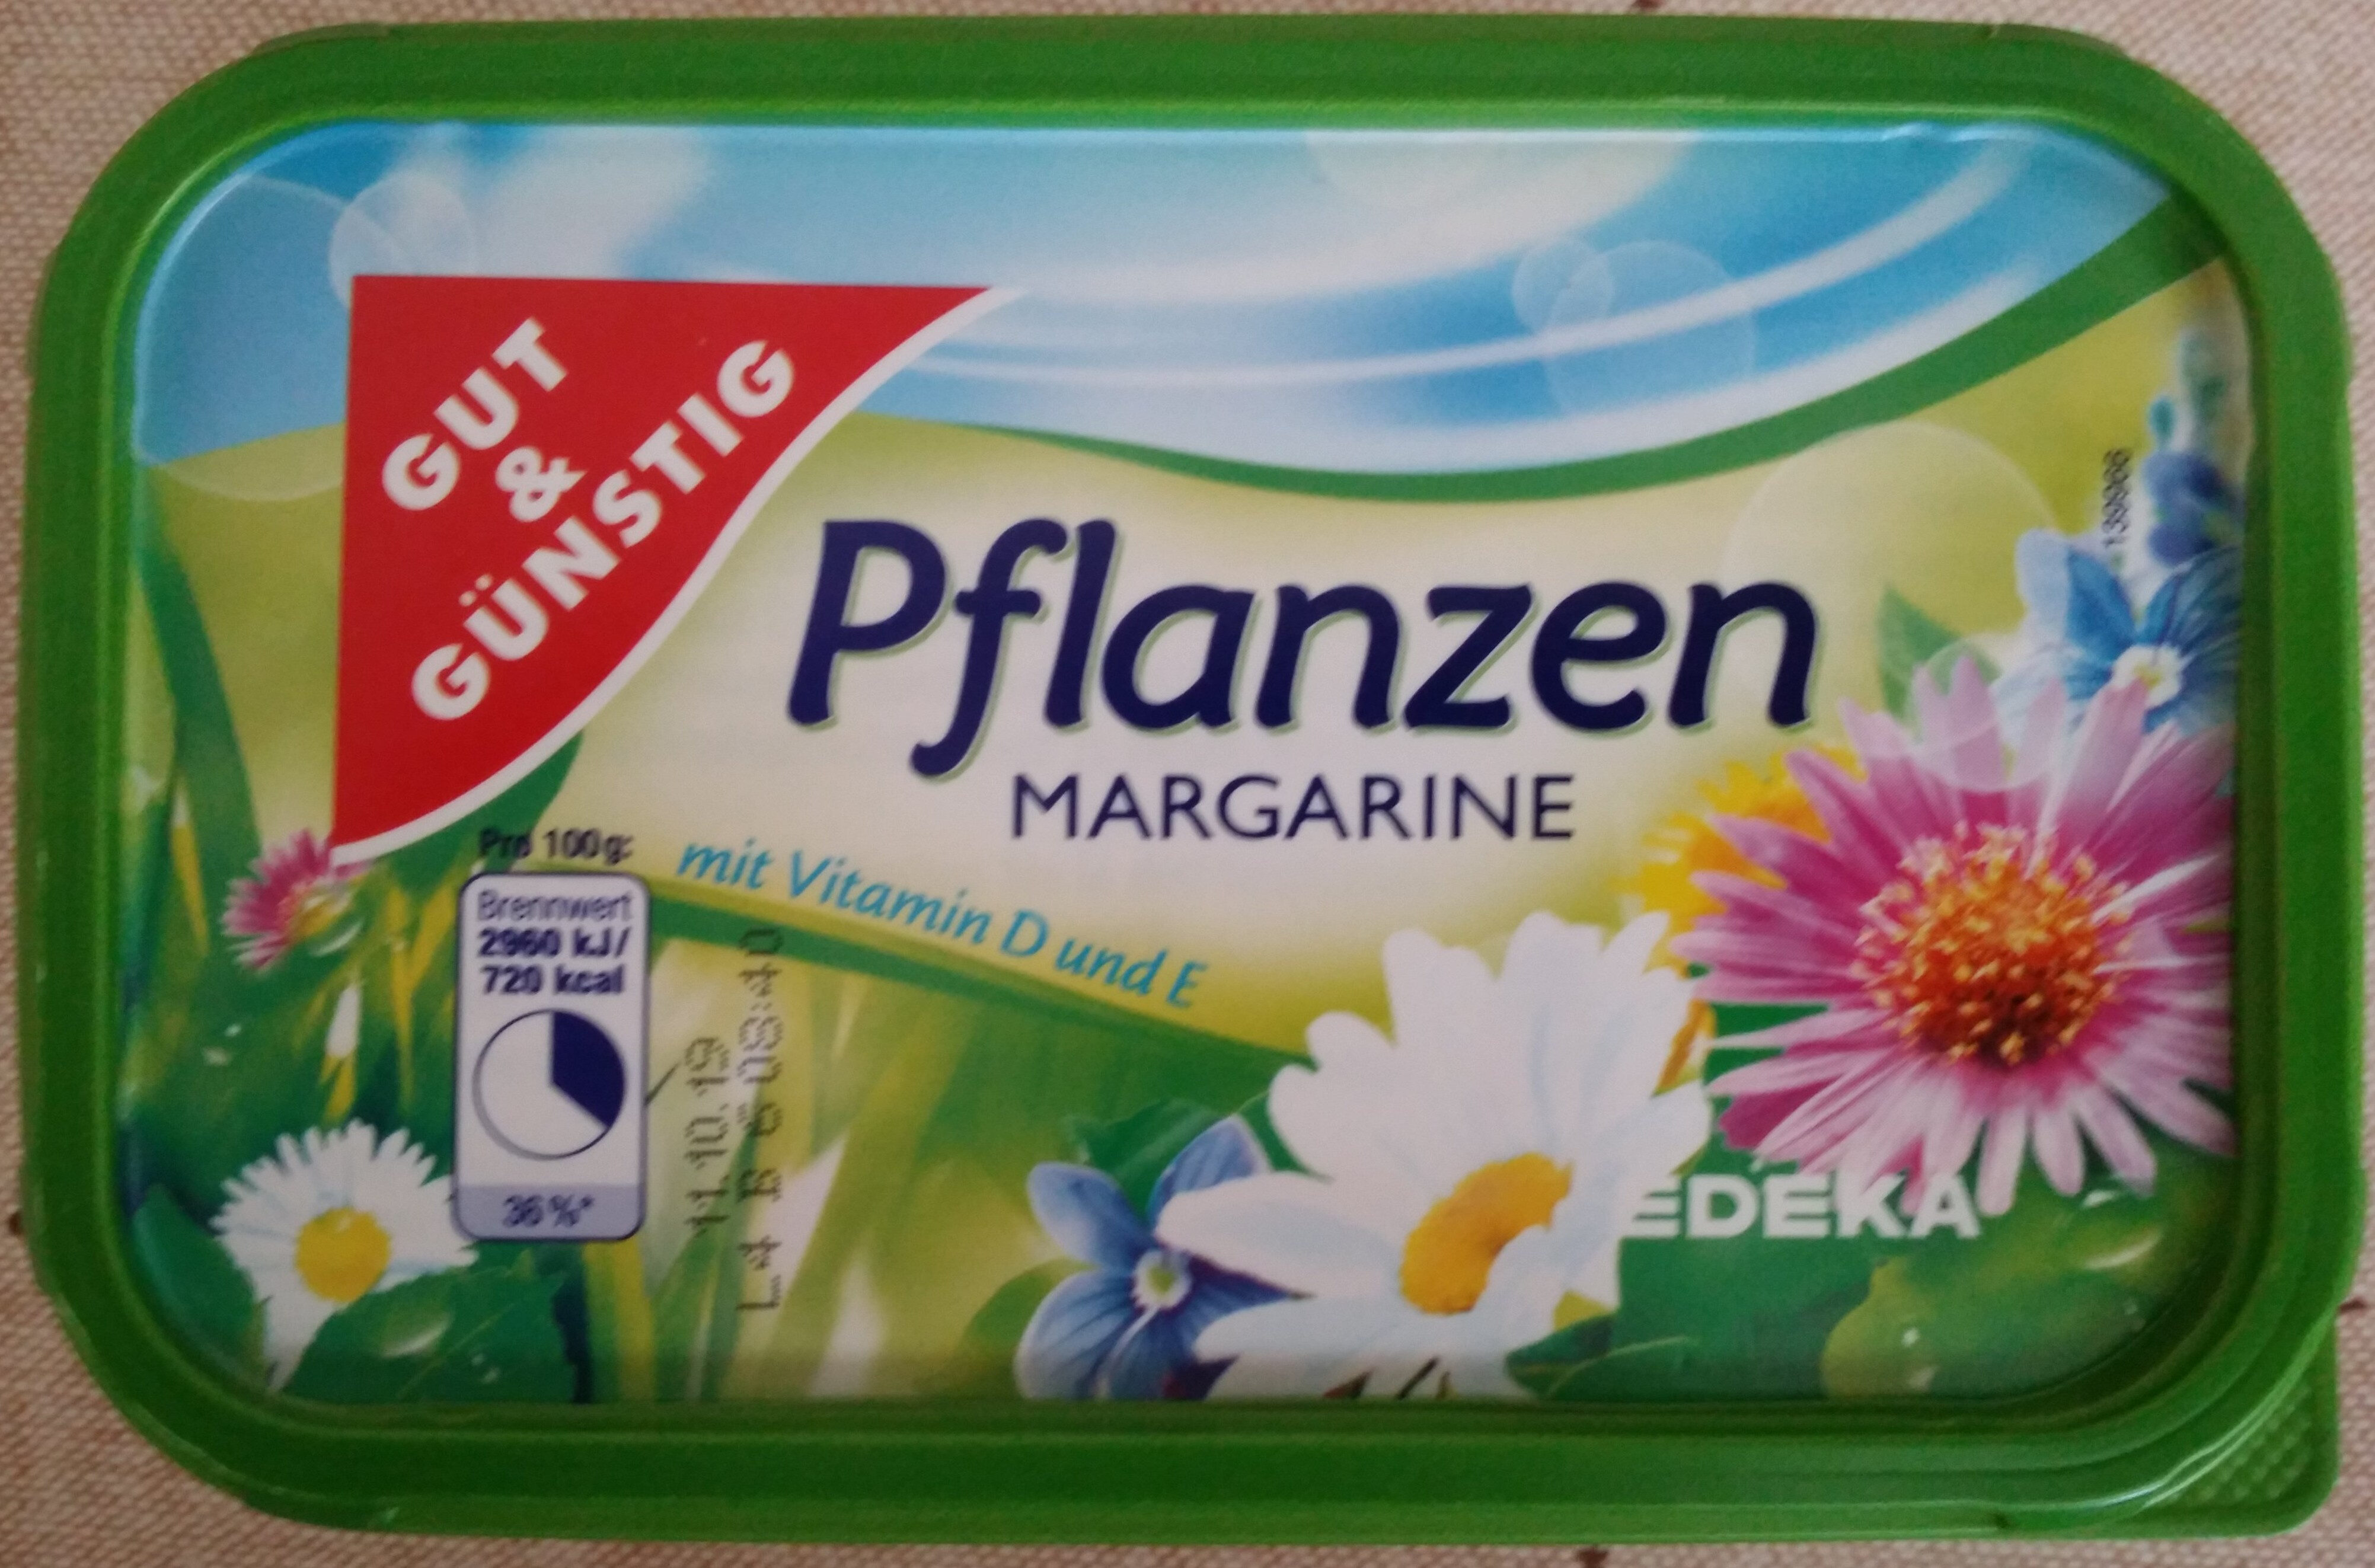 Pflanzen Margarine - Product - de